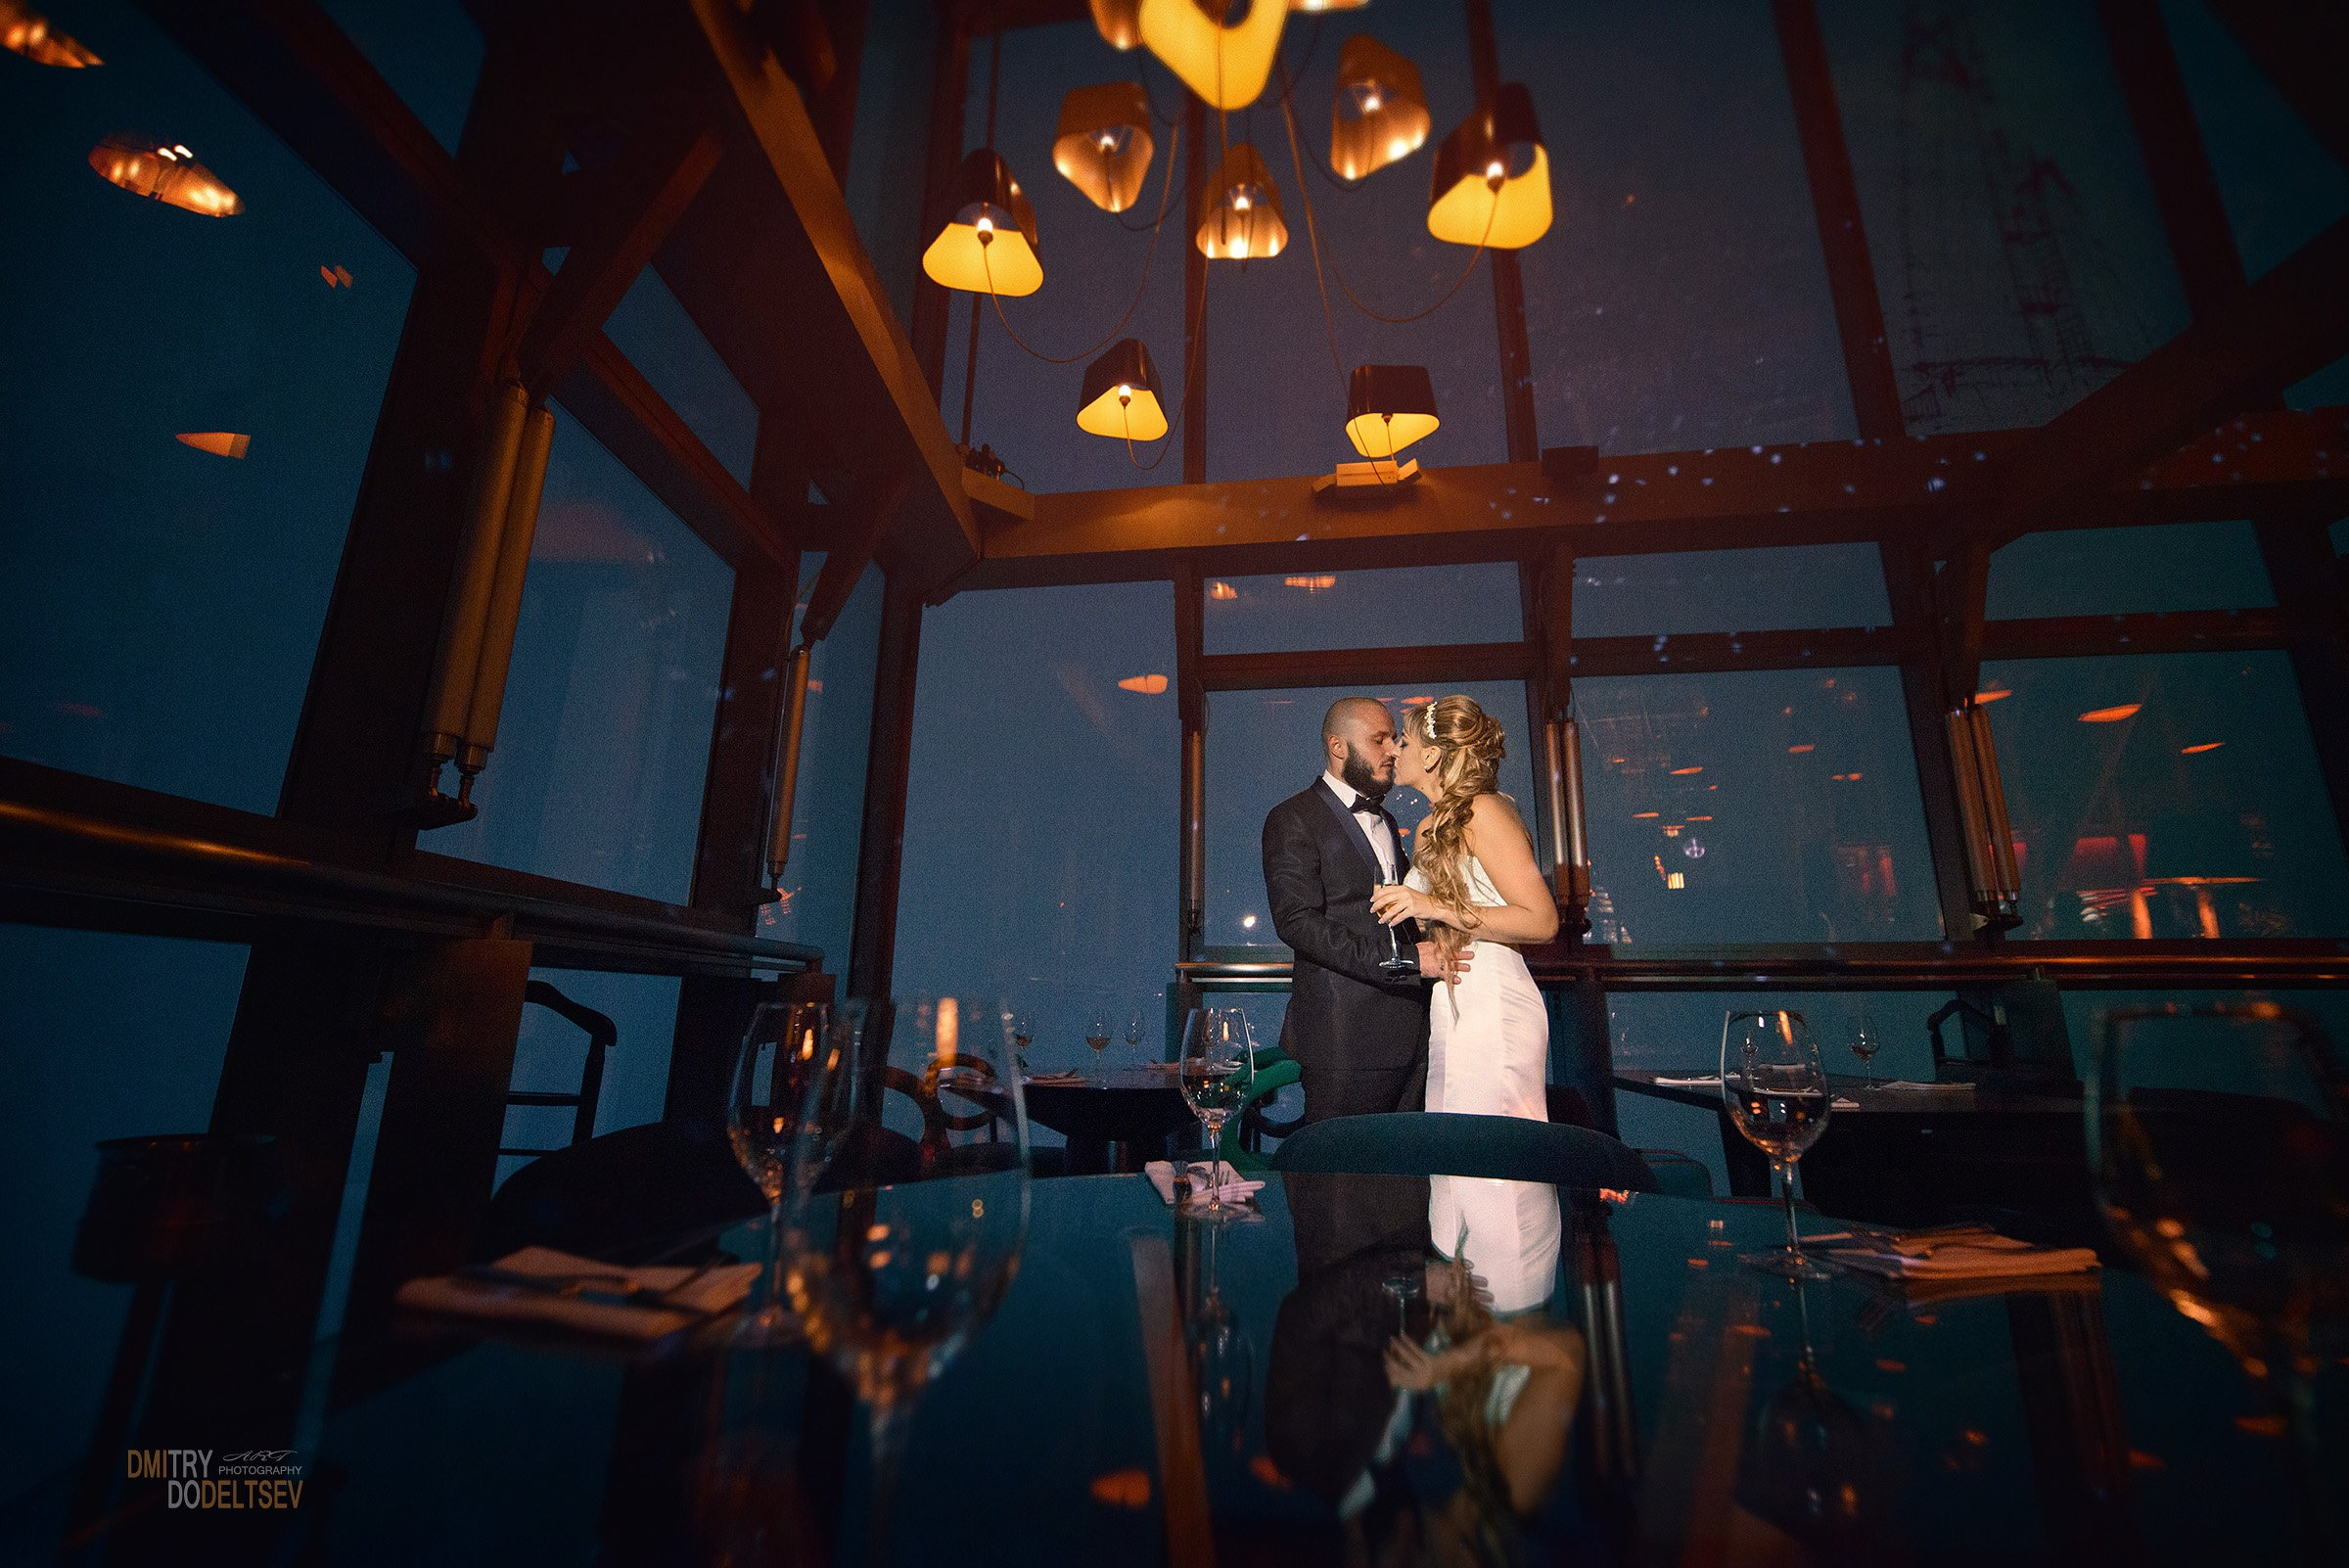 Москва сити, Sixty, ресторан, свадьба, жених, невеста, ночь, Дмитрий Додельцев